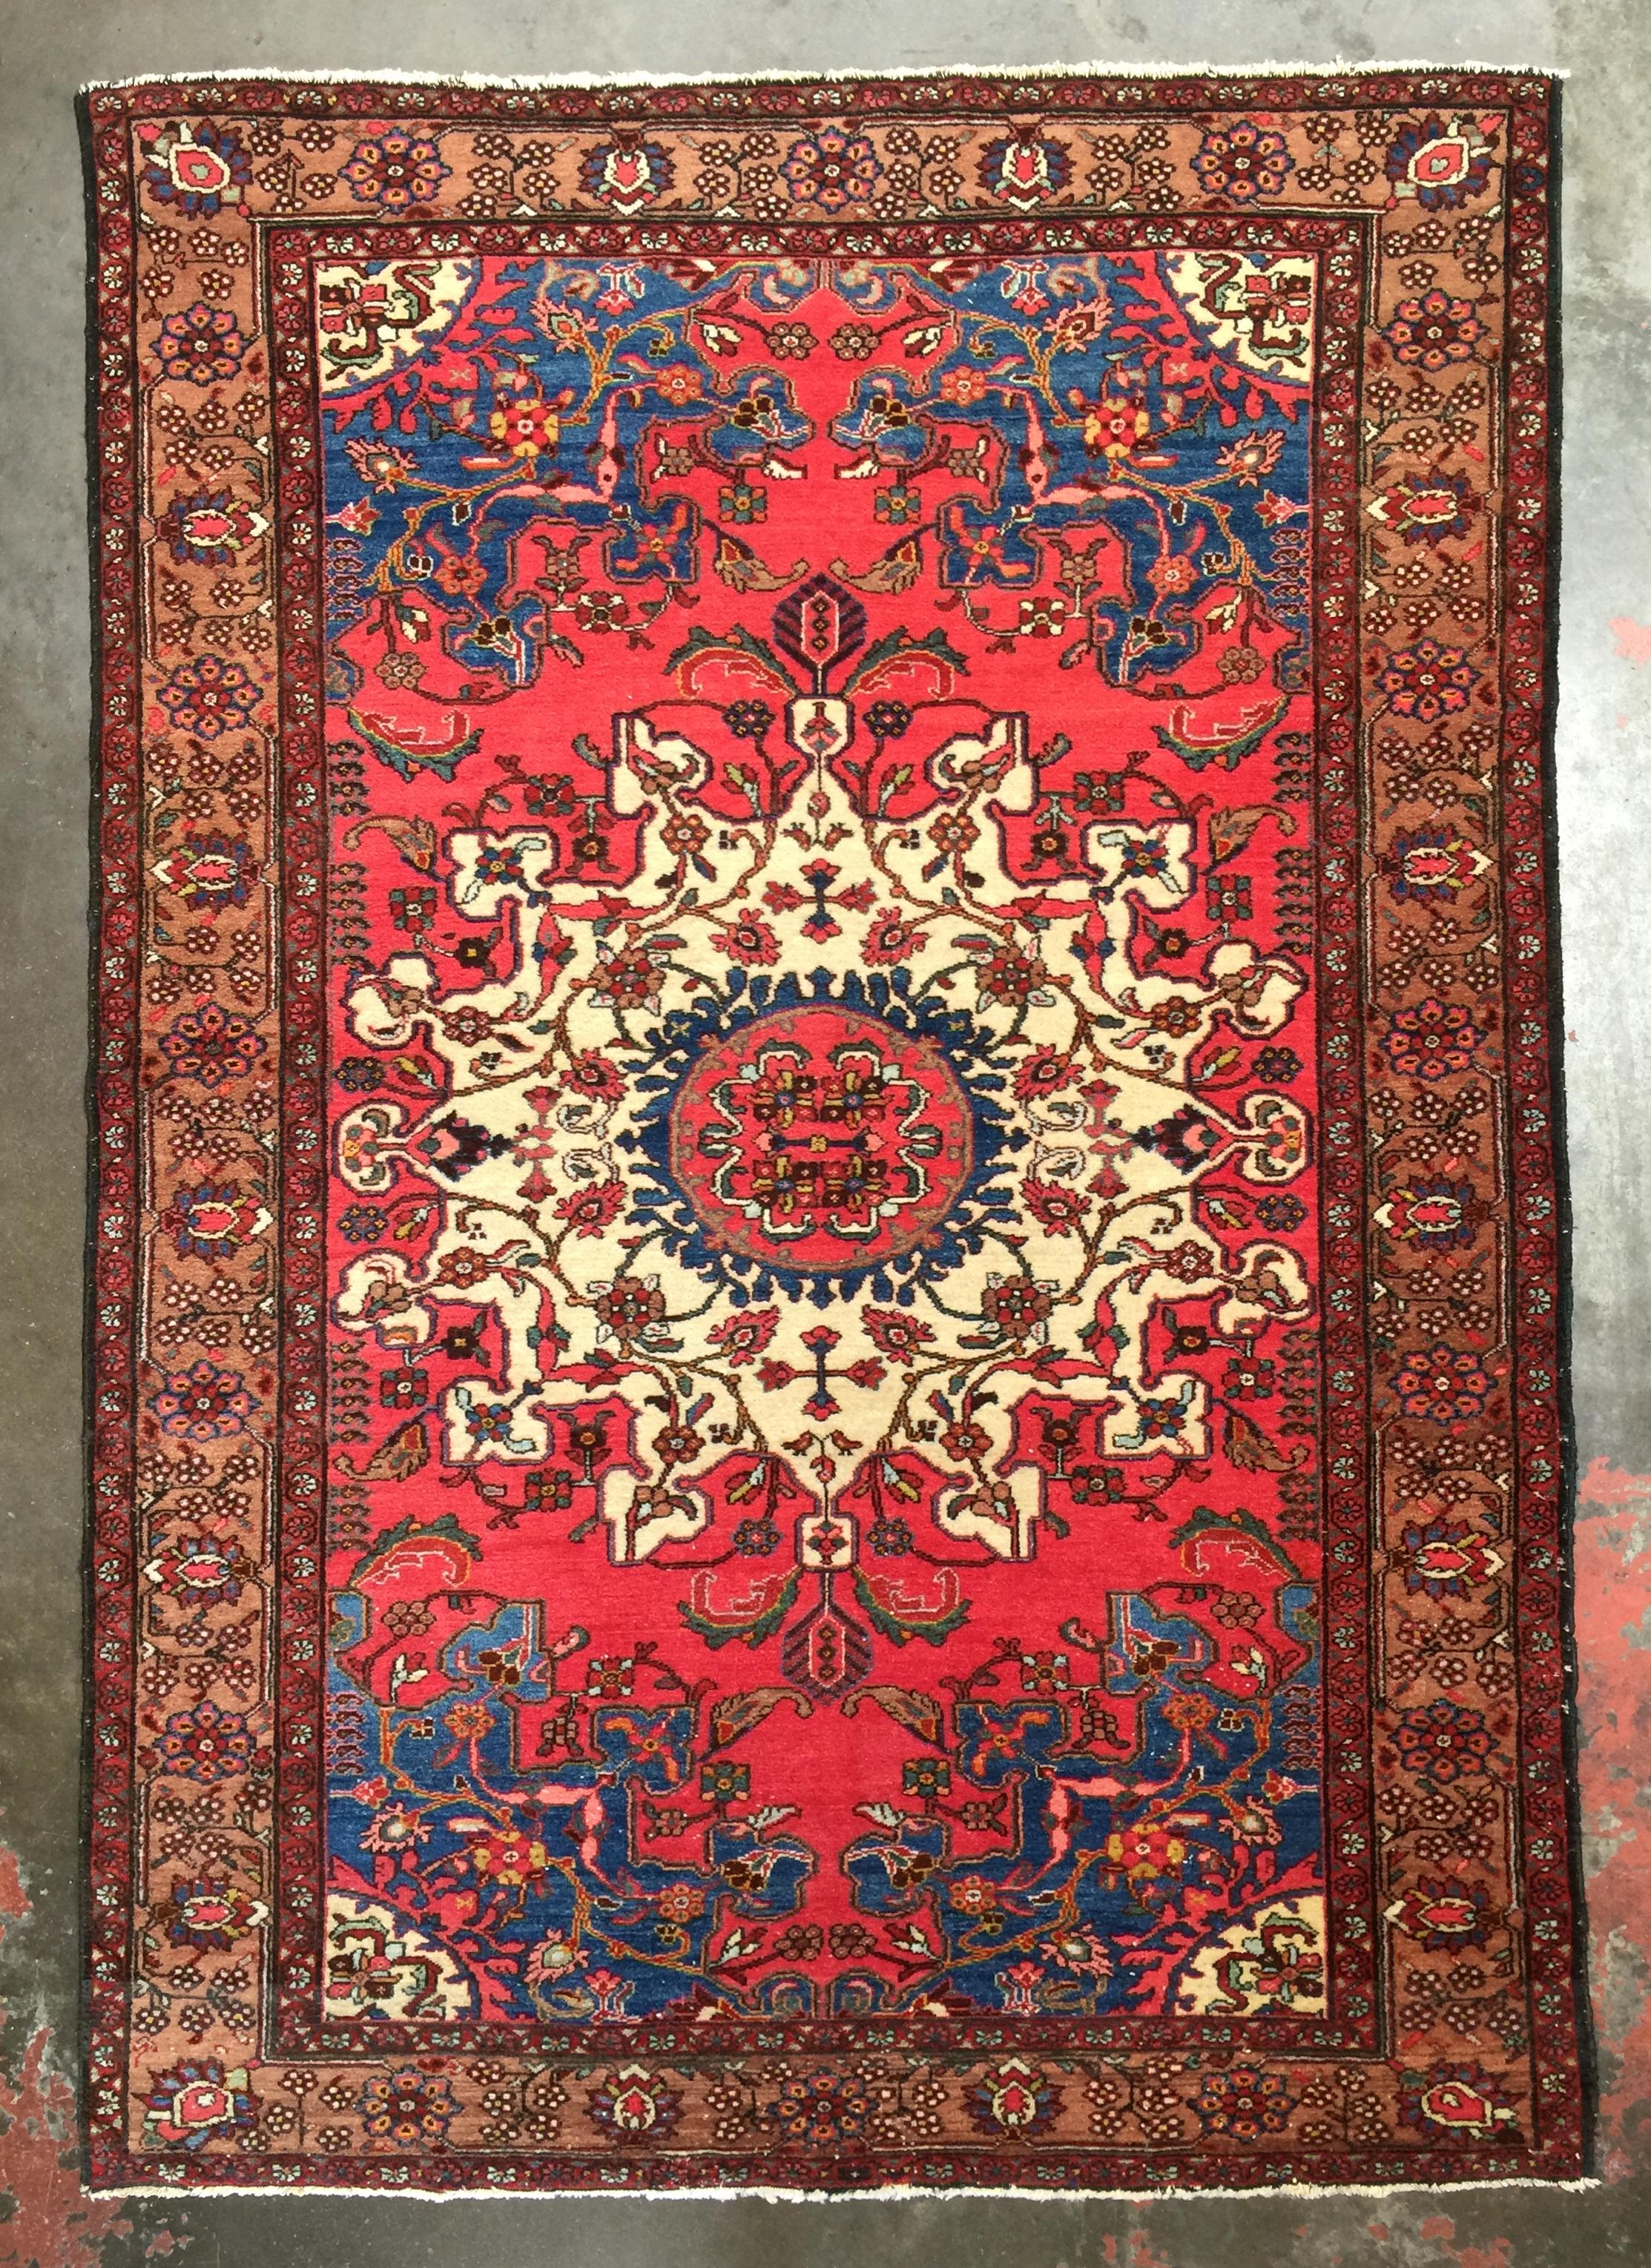 Steelman Rugs Antique Persian Rug 4